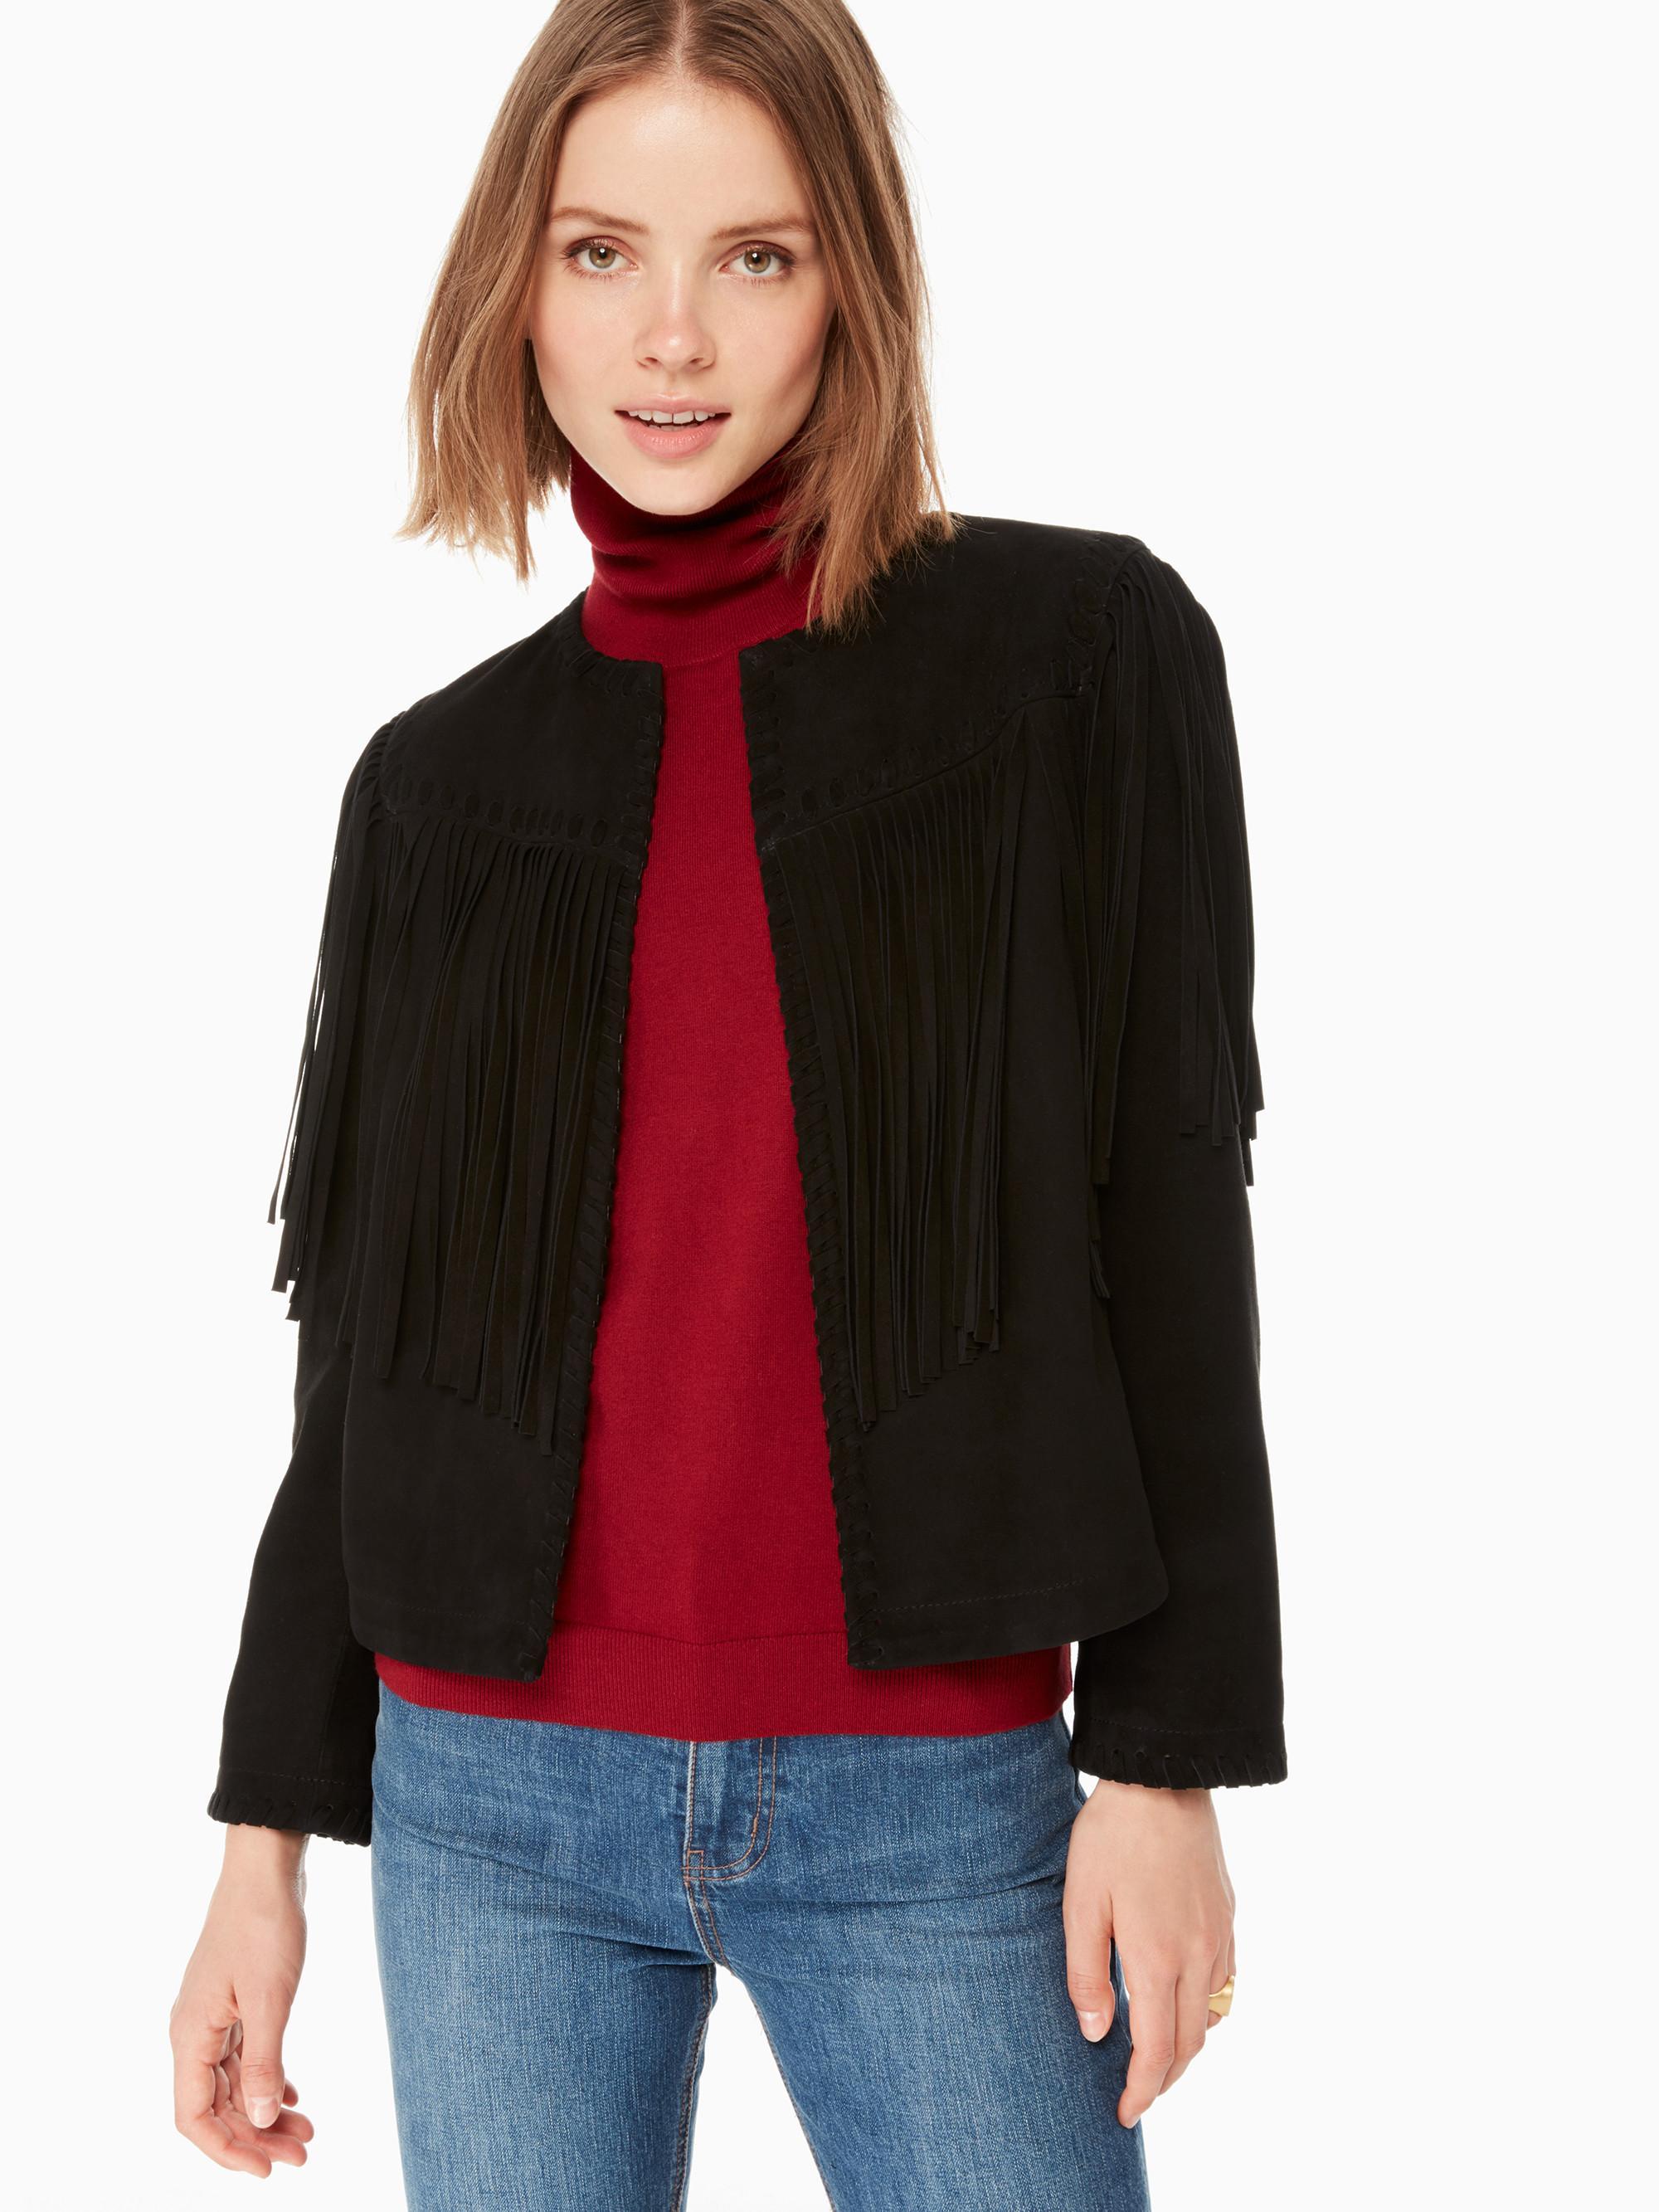 Kate Spade Daisi Jacket In Black